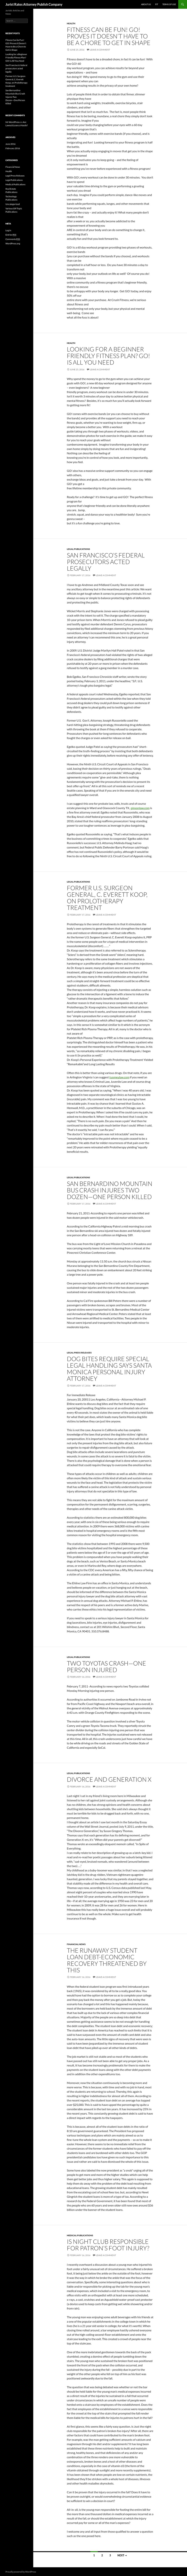 Jra Publish Competitors, Revenue and Employees - Owler Company Profile